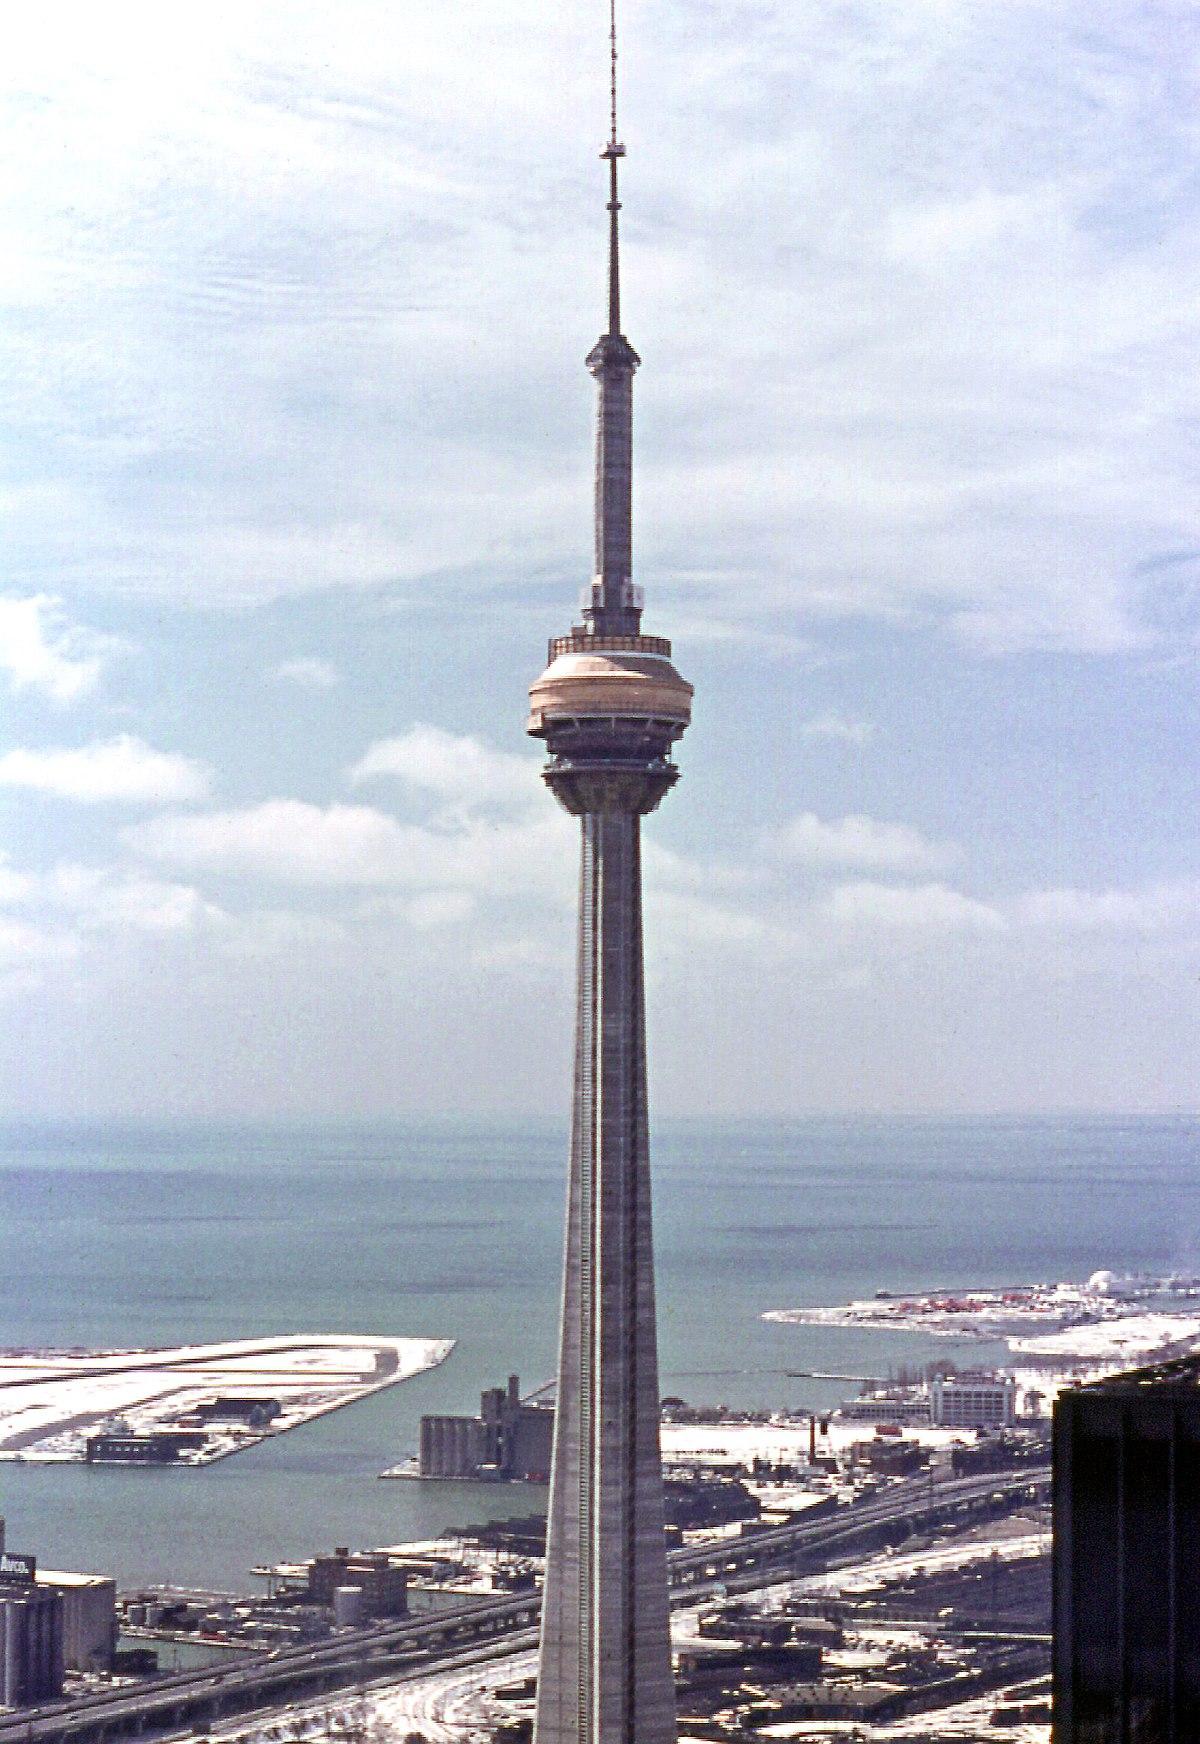 Datei:CN Tower under construction.jpg – Wikipedia